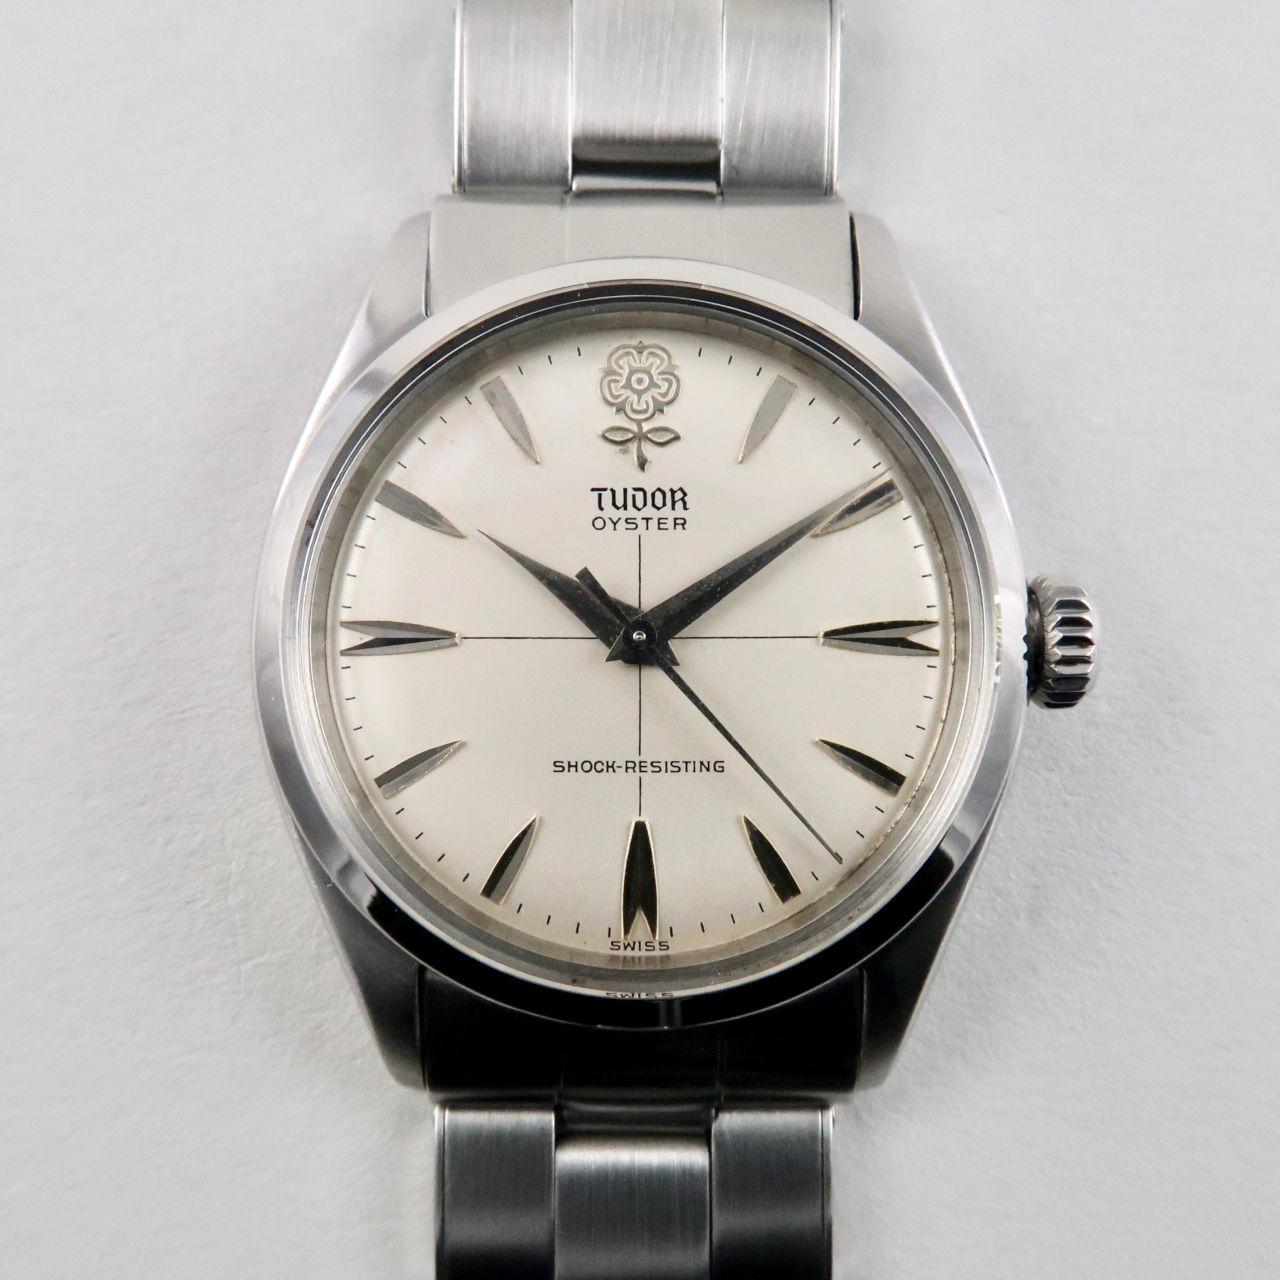 Tudor Oyster 'Big Rose' Ref.7934 steel vintage wristwatch, dated 1959